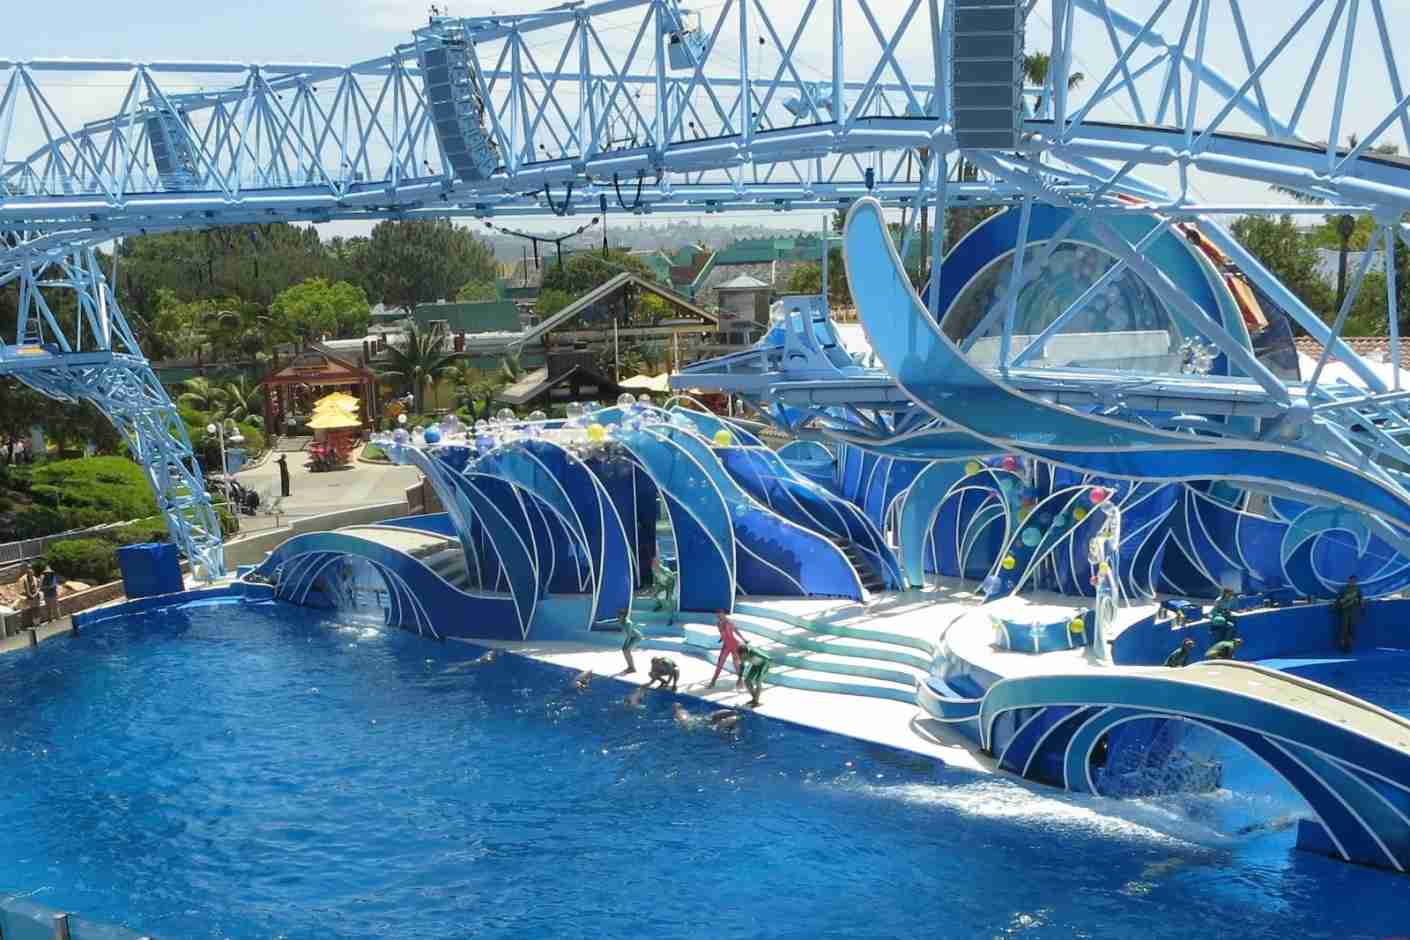 Sea World San Diego Dolphin Show